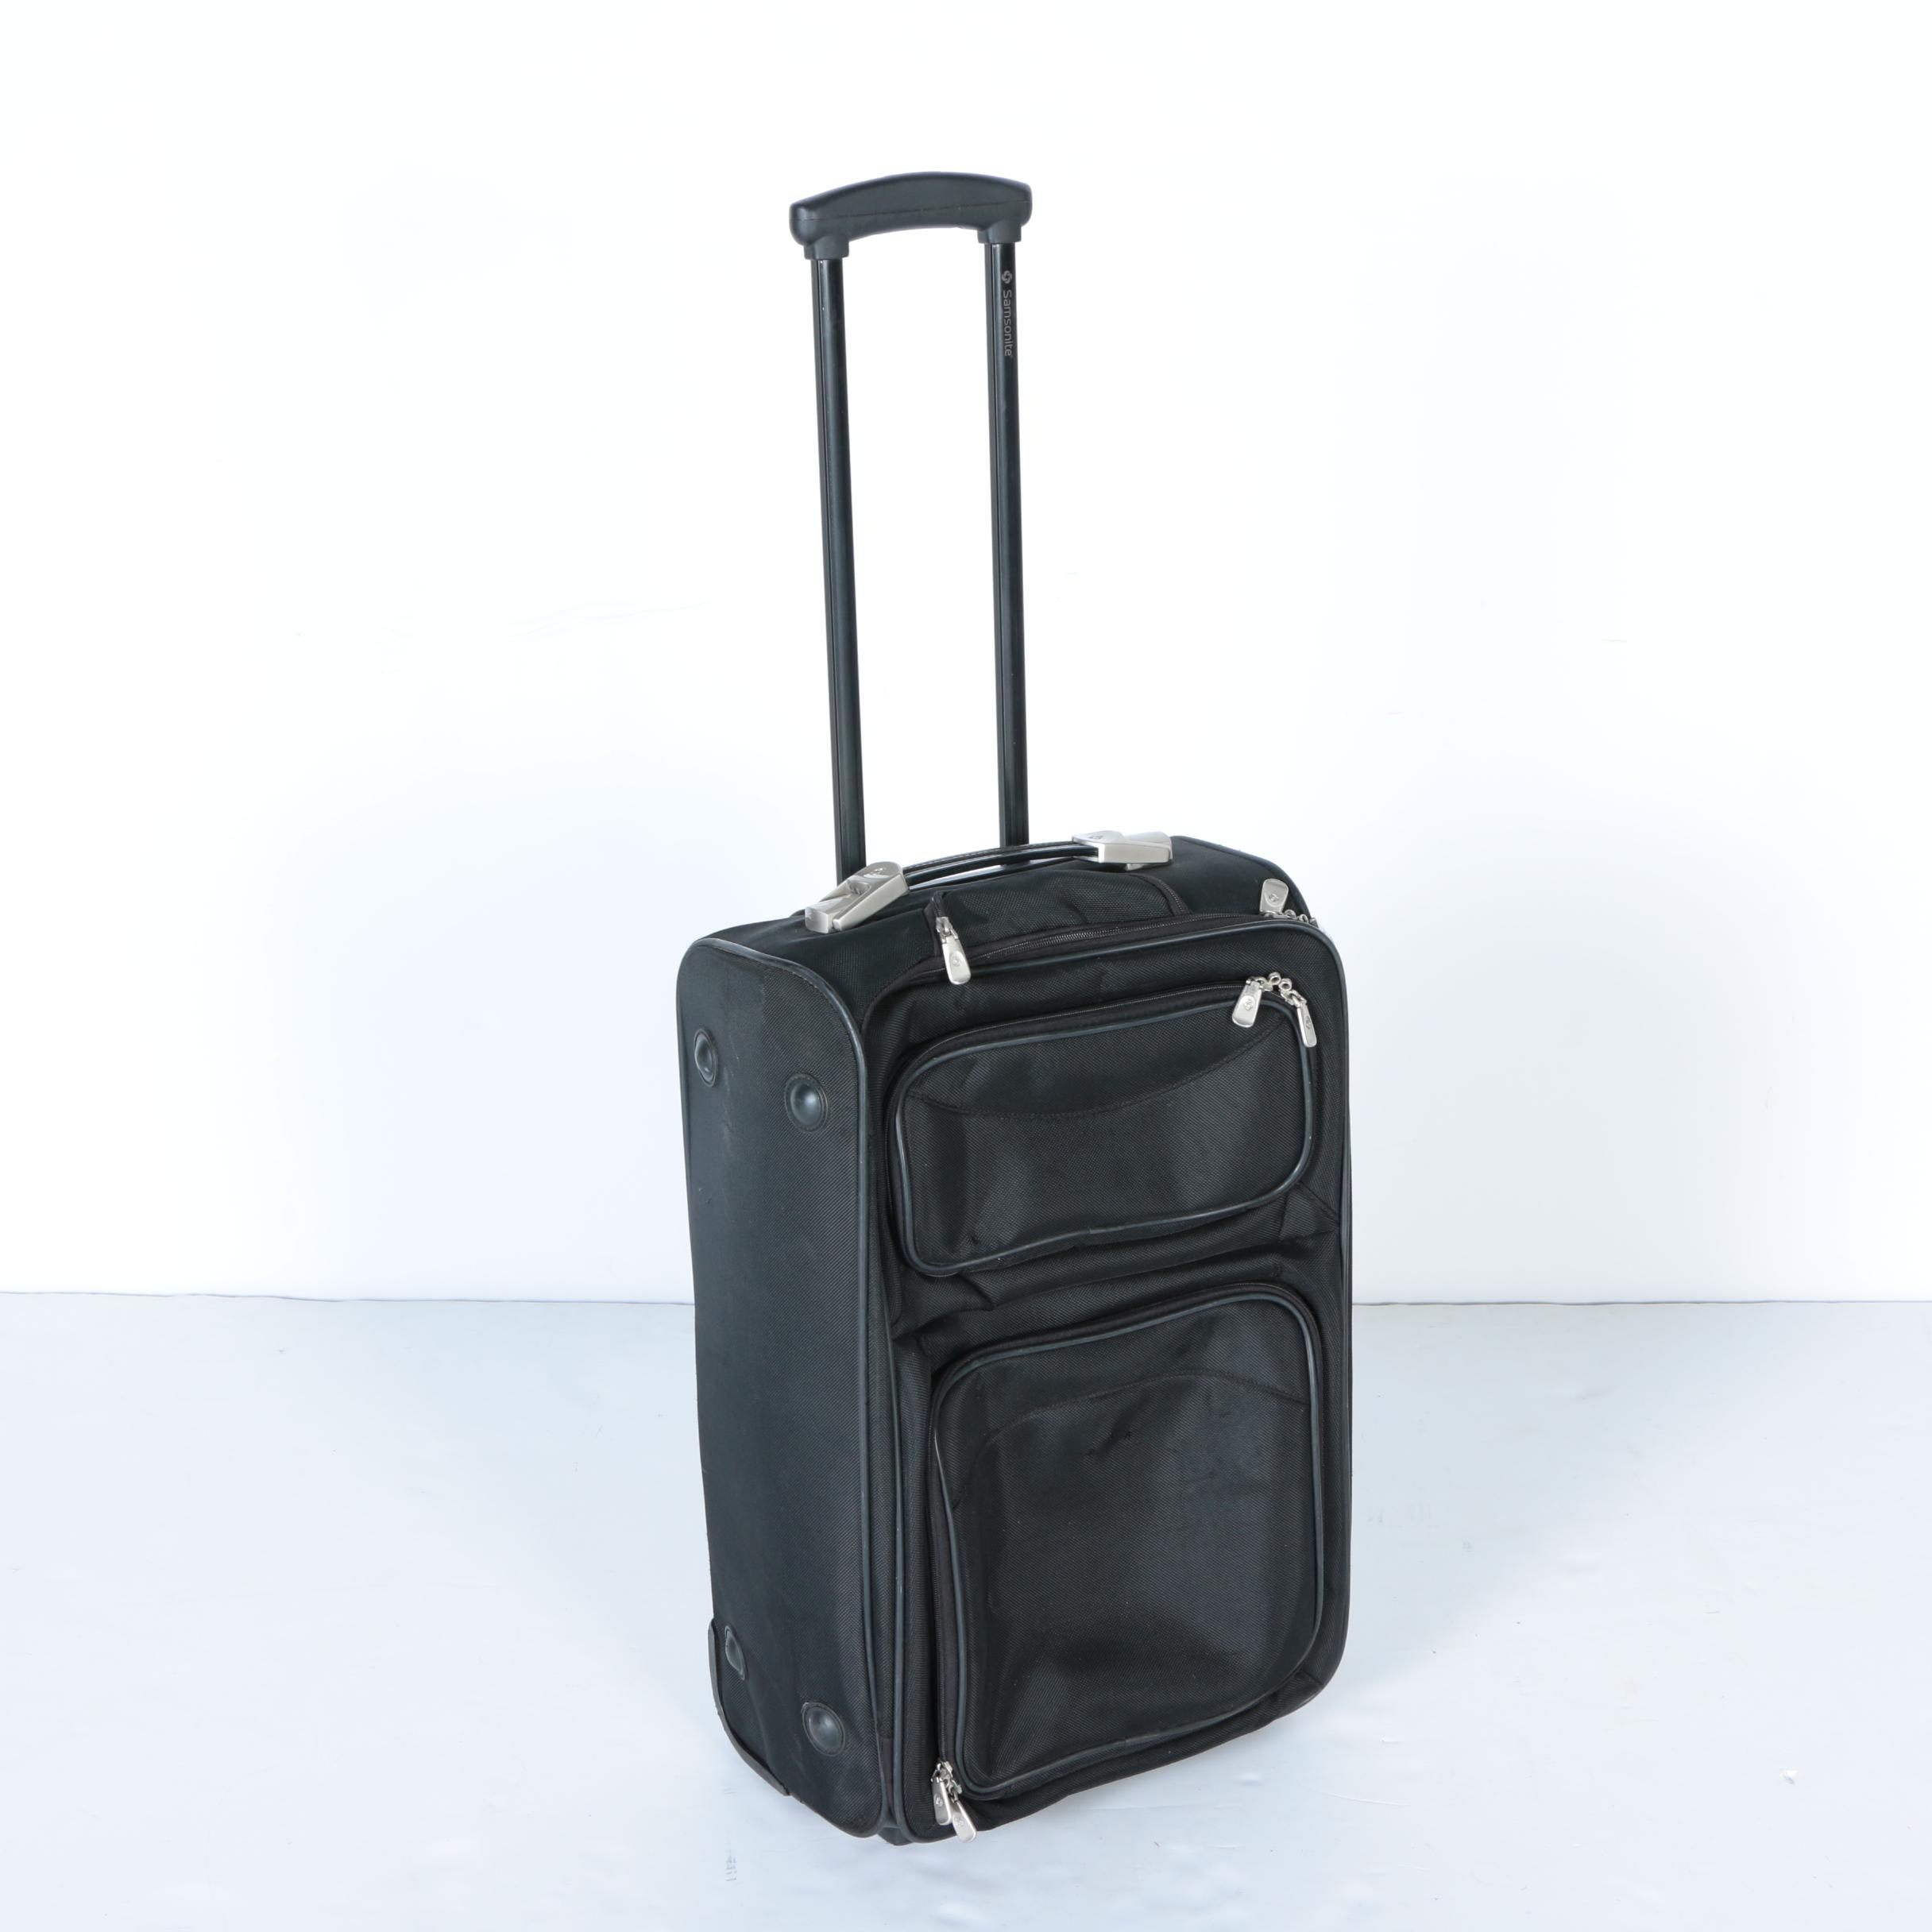 Samsonite Rolling Luggage